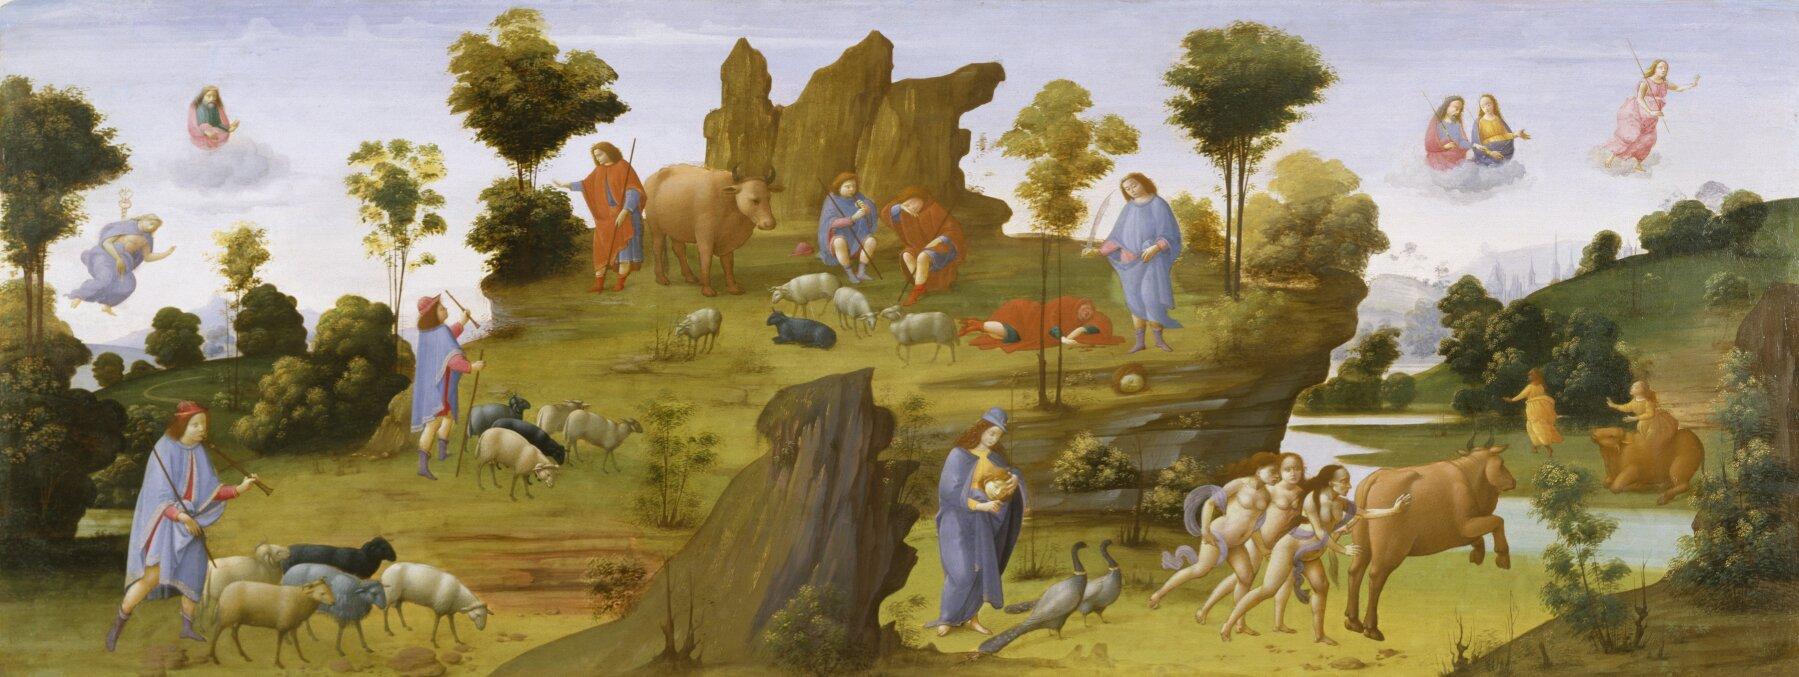 Mit oIo Źródło: Bartolomeo di Giovanni, Mit oIo, ok. 1490, Walters Art Museum, USA, domena publiczna.